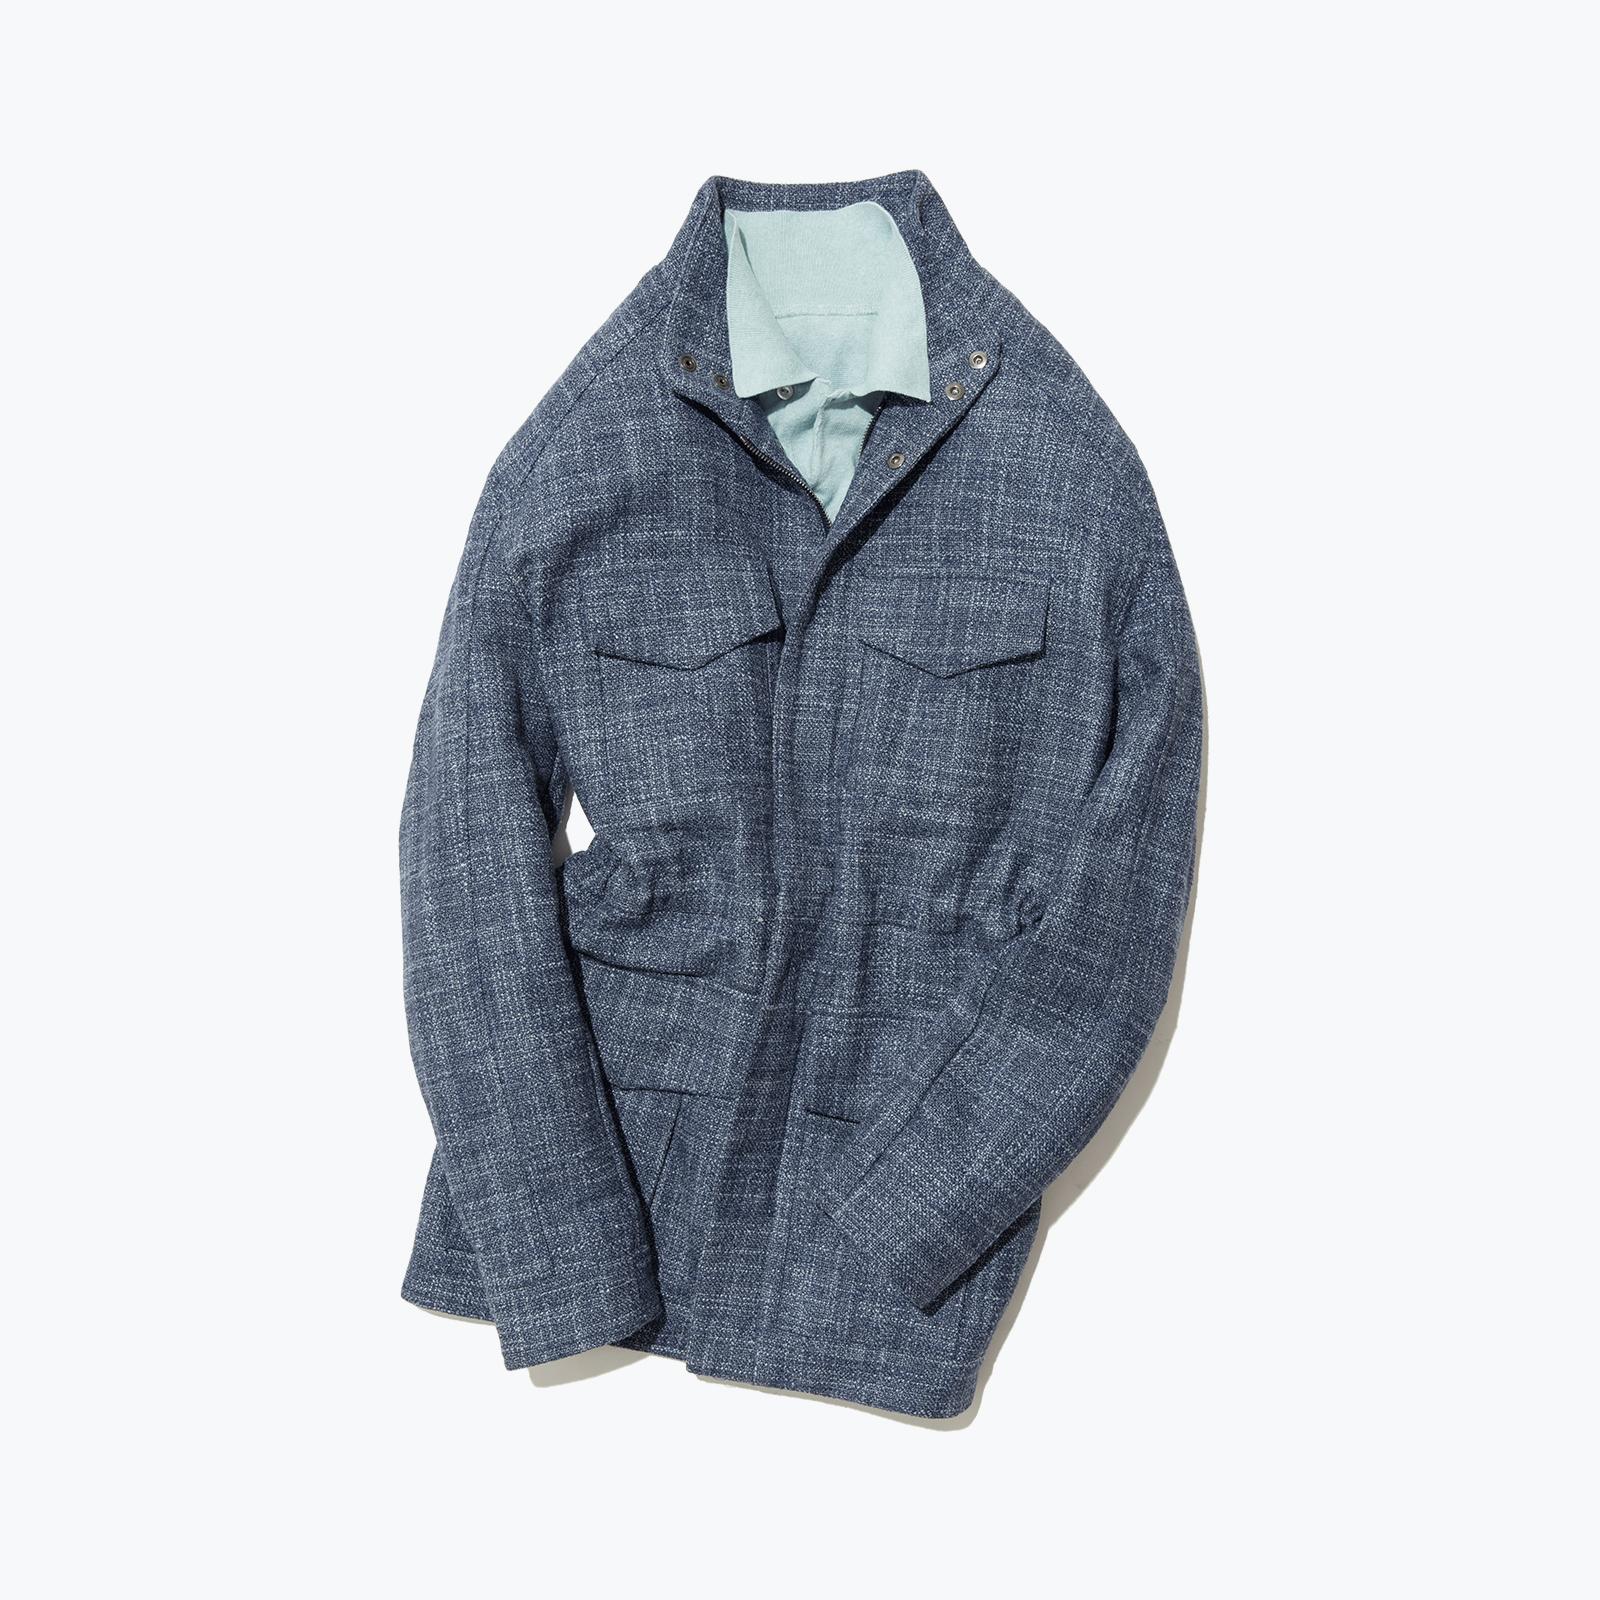 stoffa clothing la stoffa clothing styleforum